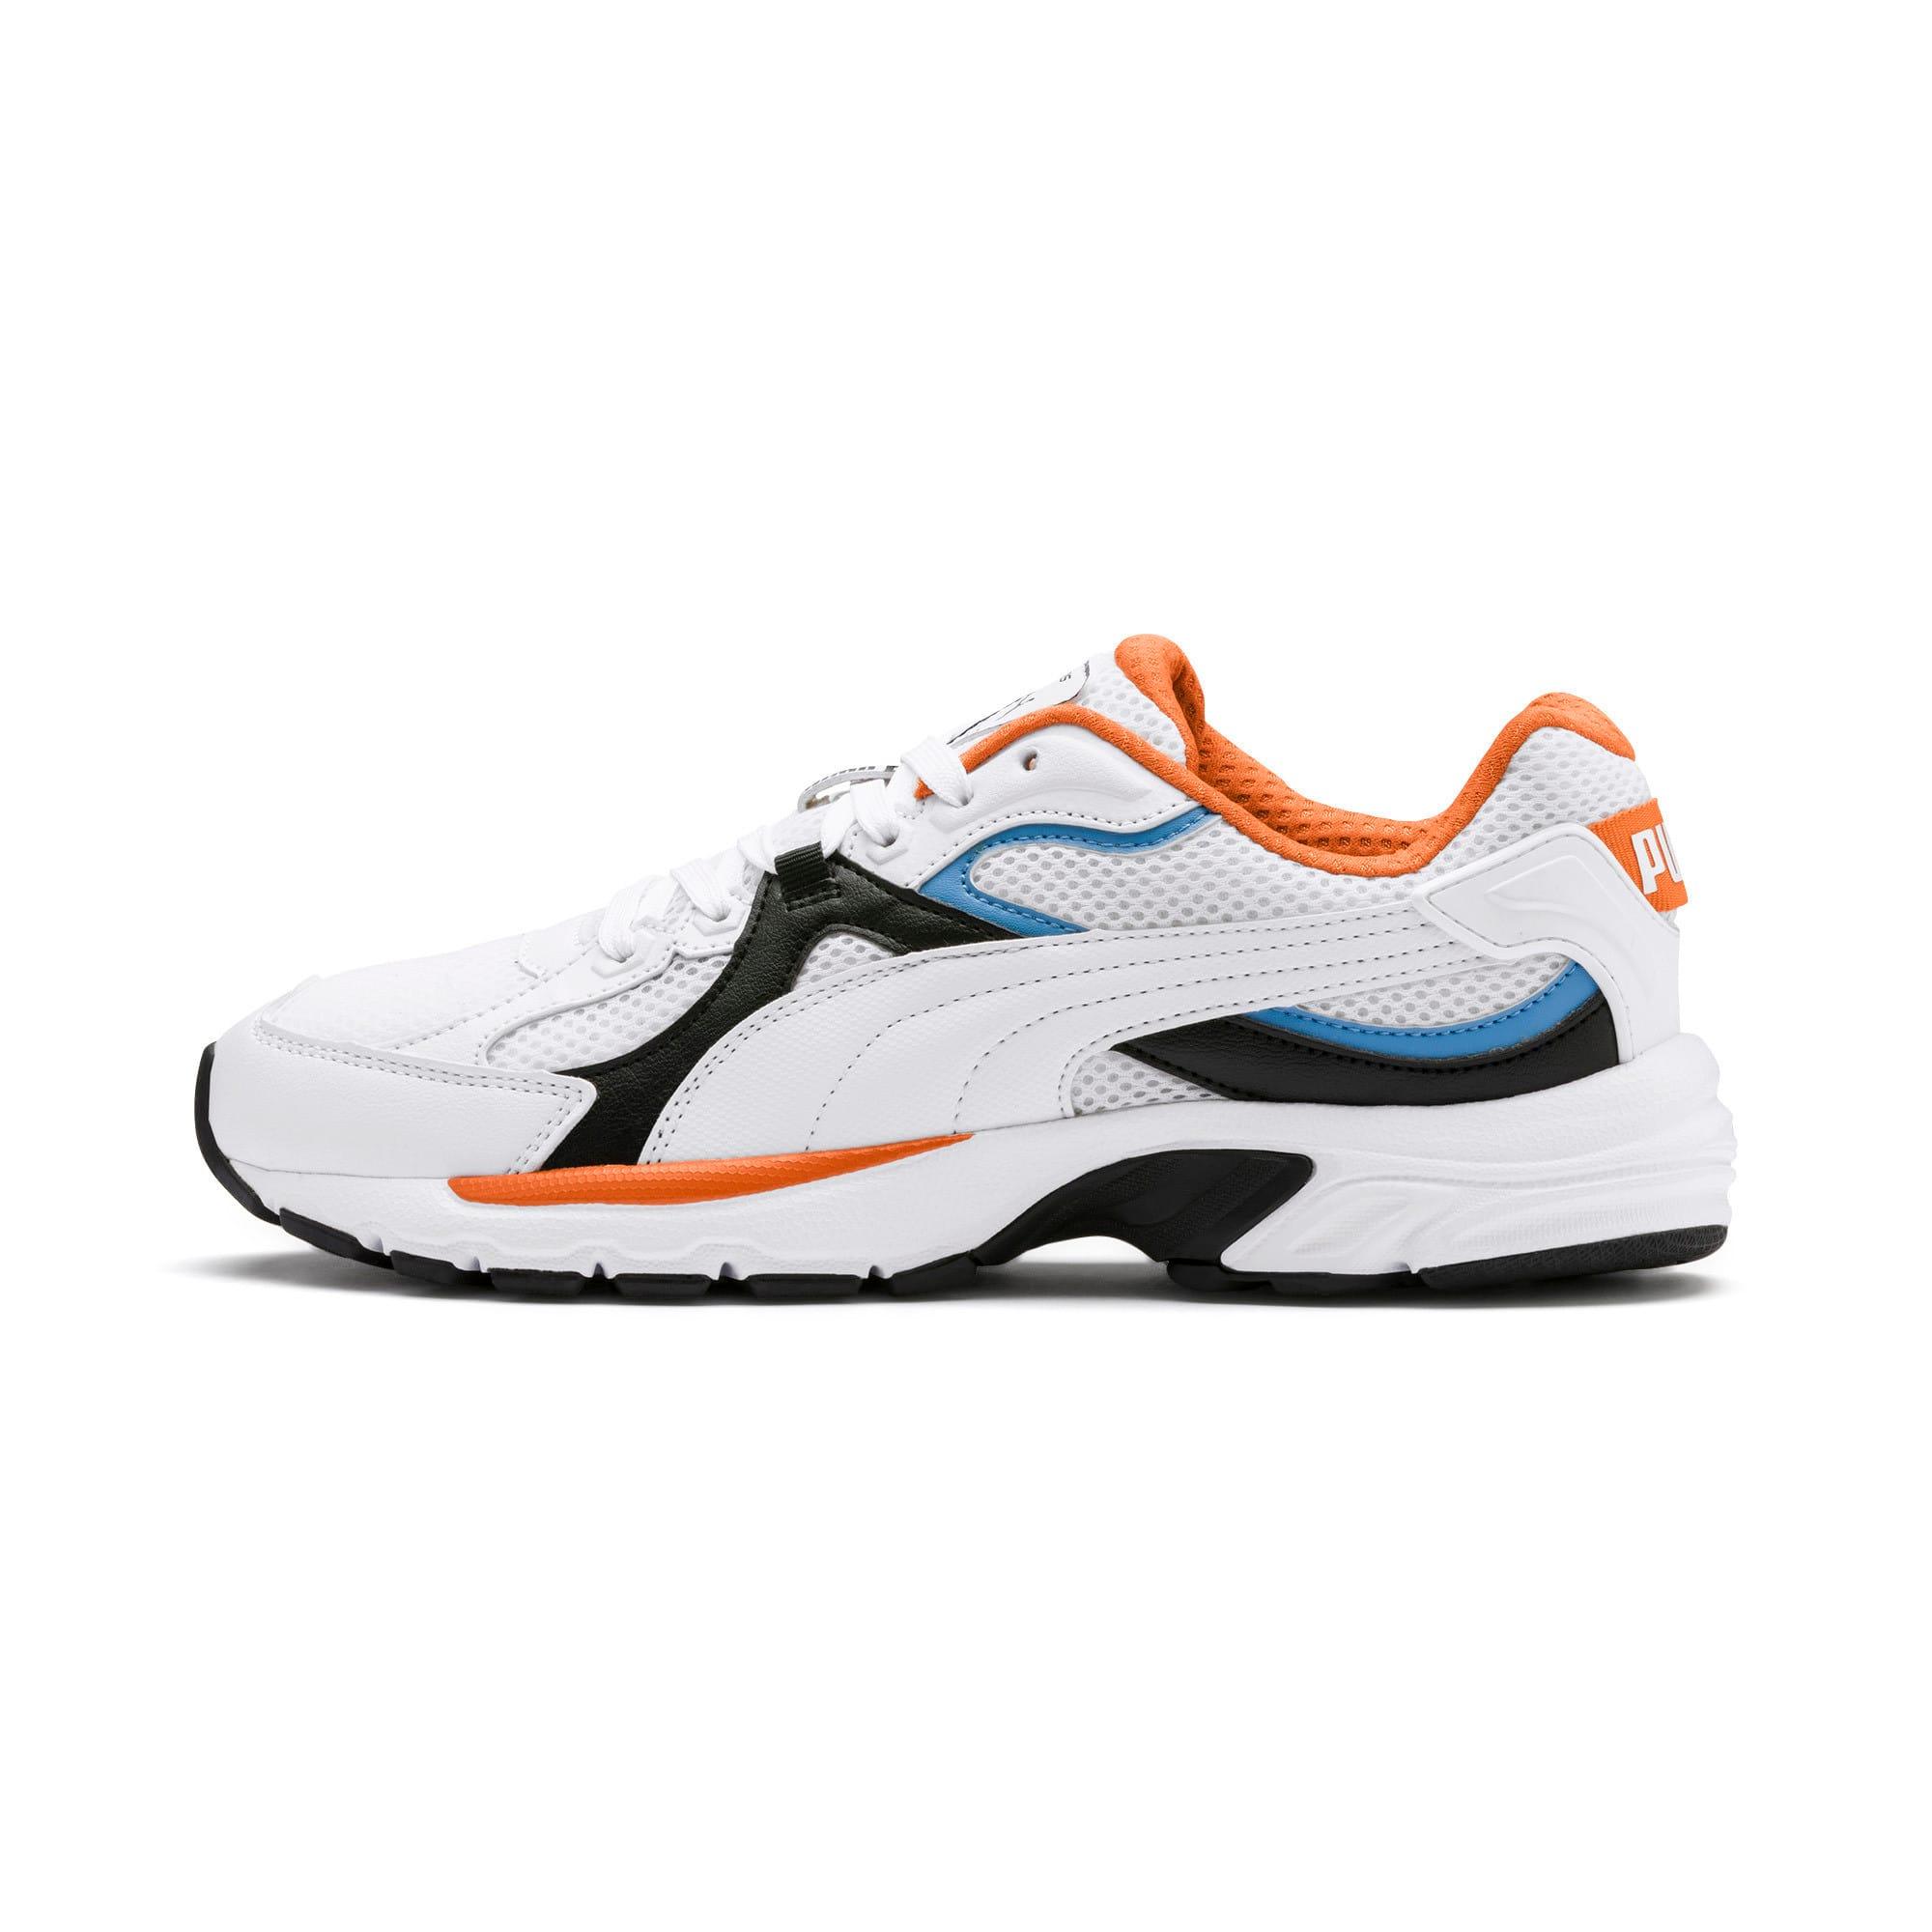 Thumbnail 1 of Axis Plus 90s Sneakers, White-Blk-T Lt Blue-J Orange, medium